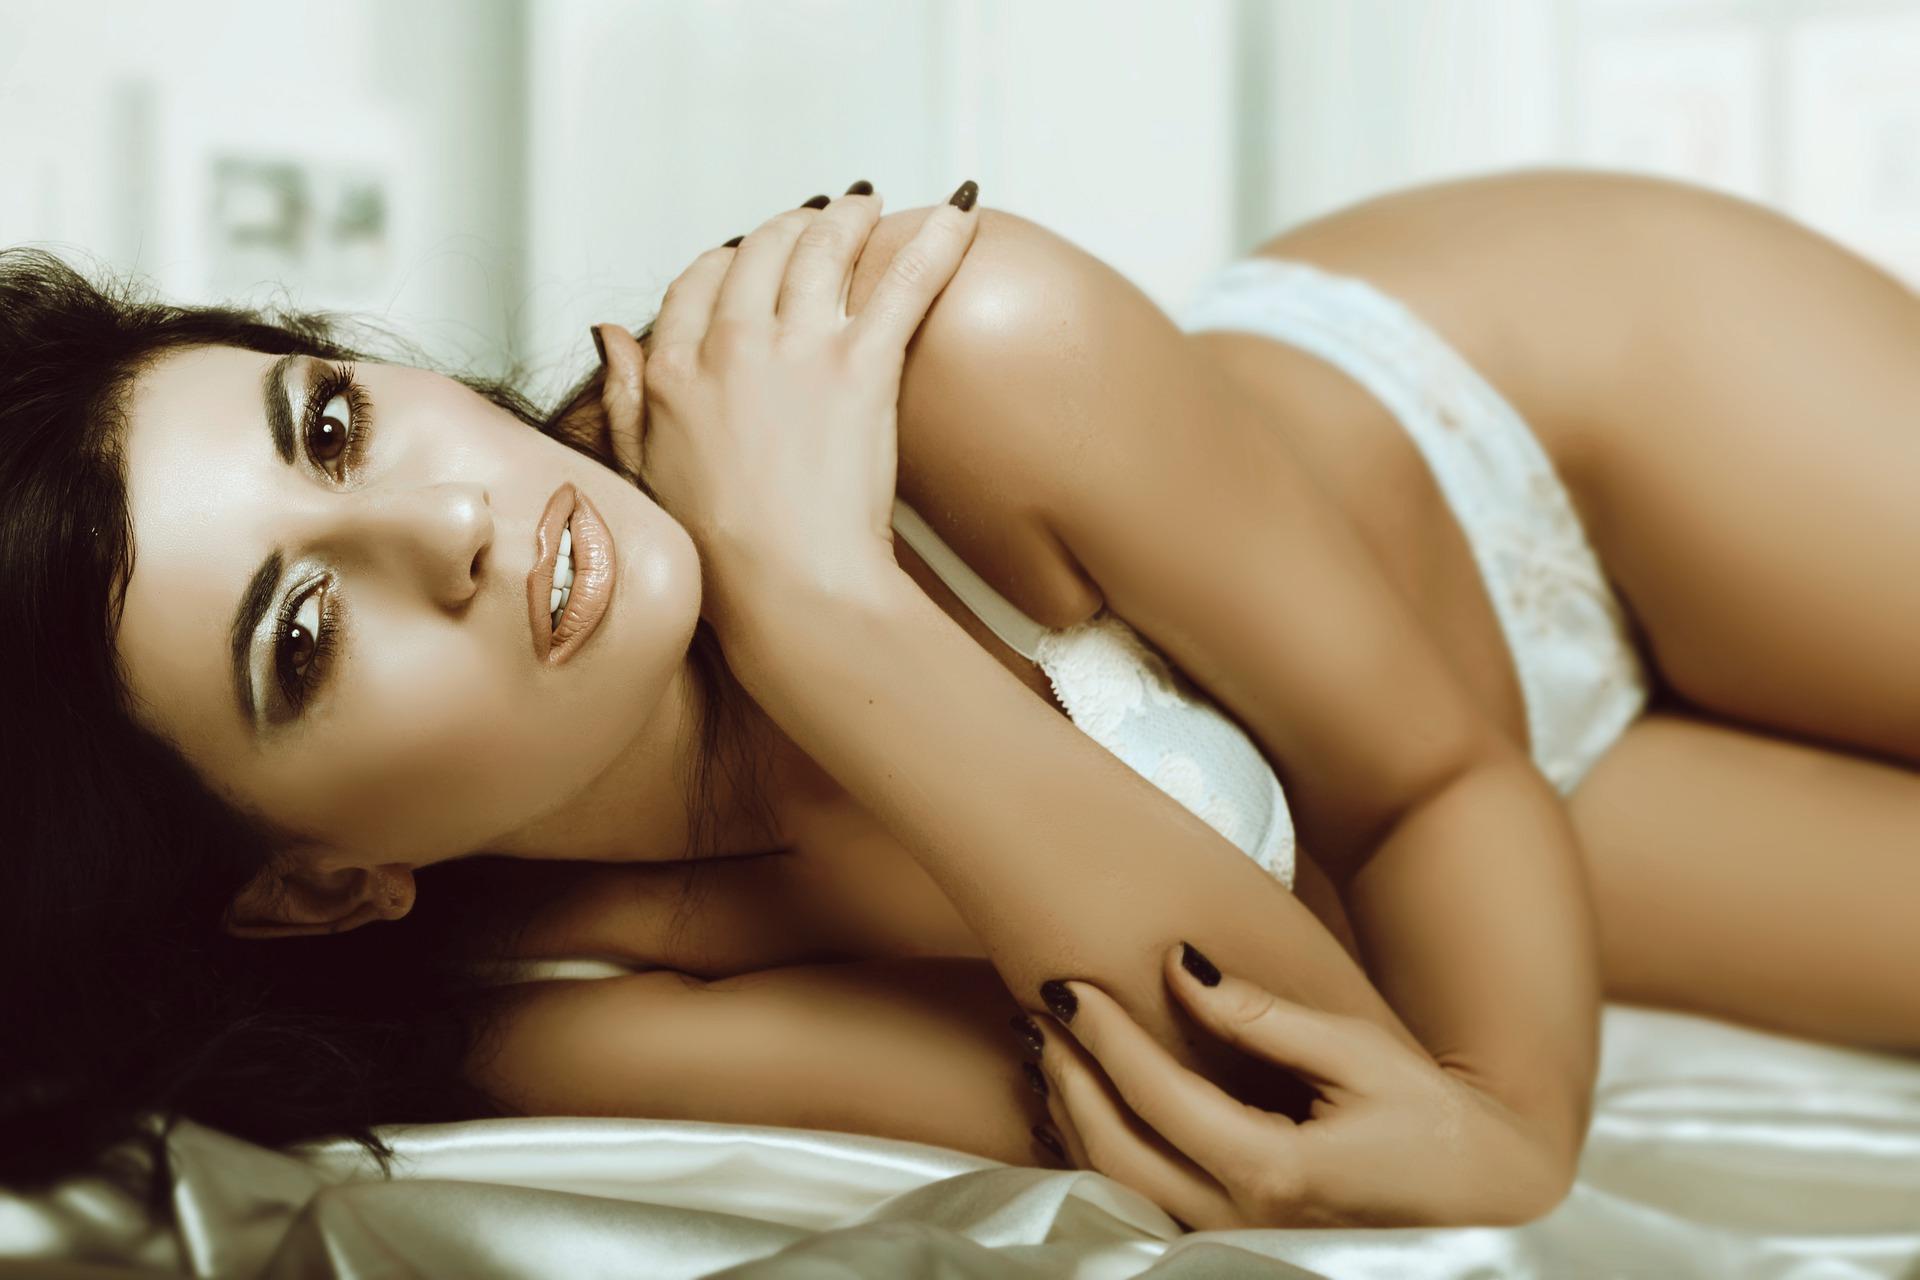 sexy-4895142_1920